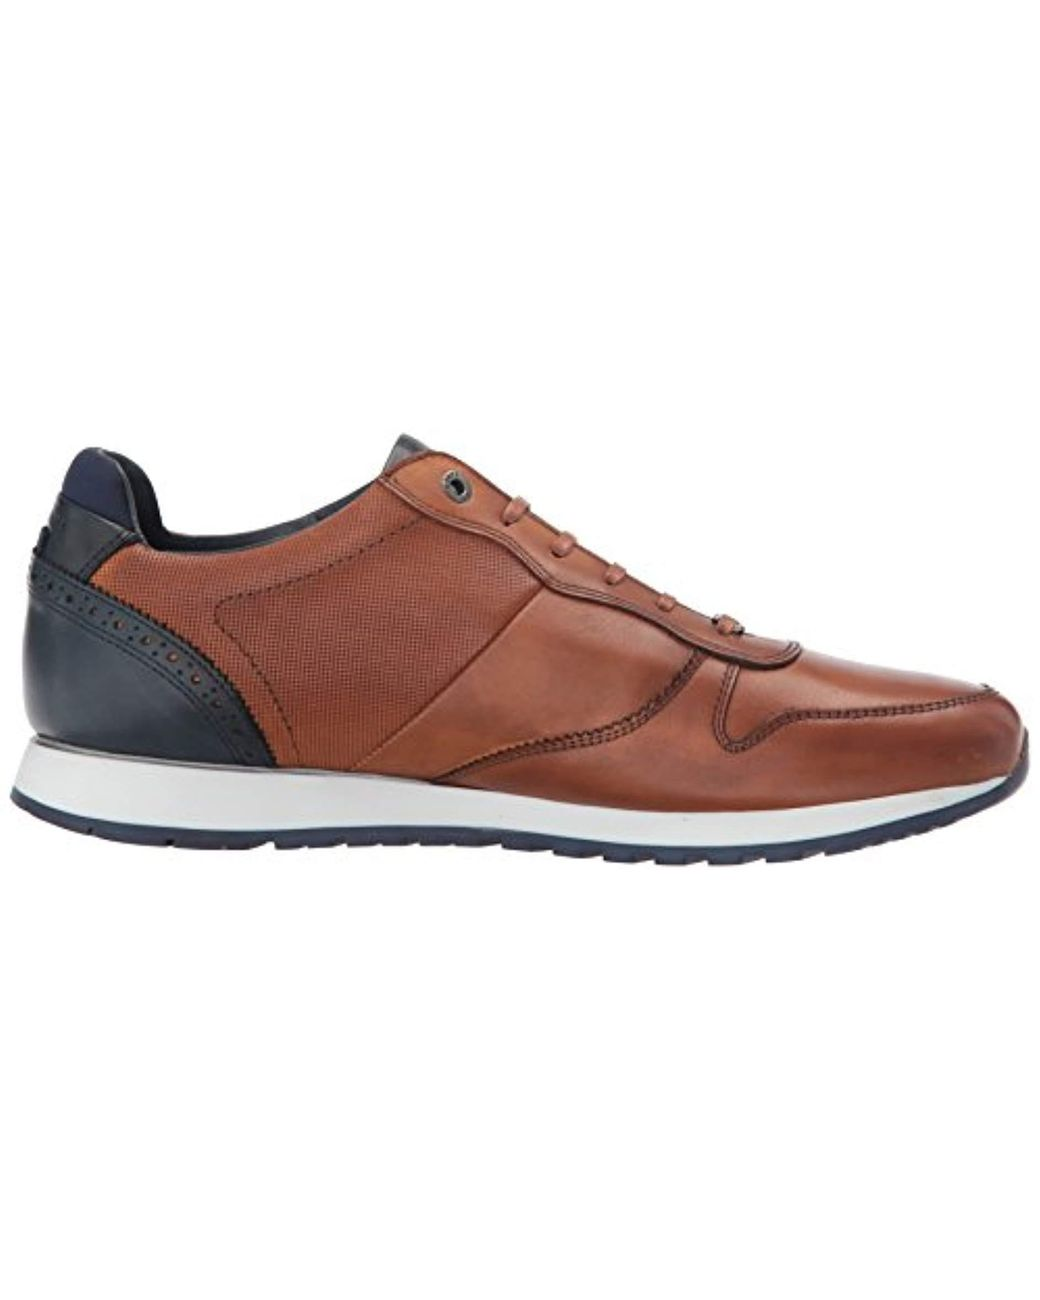 51ff89278714 Lyst - Ted Baker Shindl Sneaker for Men - Save 42%